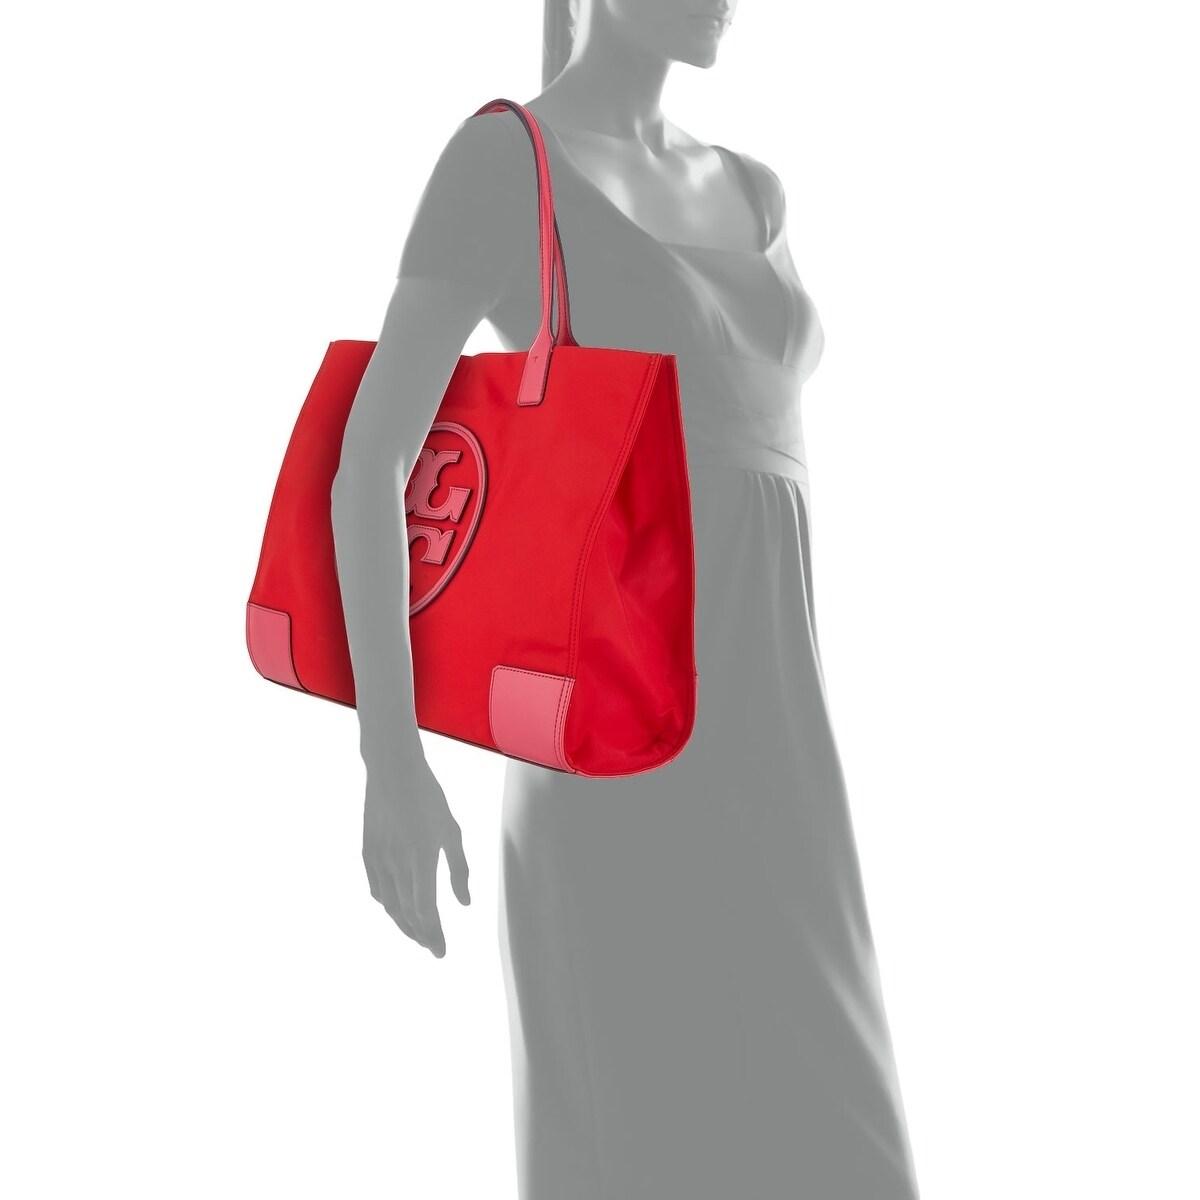 75c34b71b02 Shop Tory Burch Ella Color-Block Red Bright Azalea - Free Shipping Today -  Overstock - 23444445